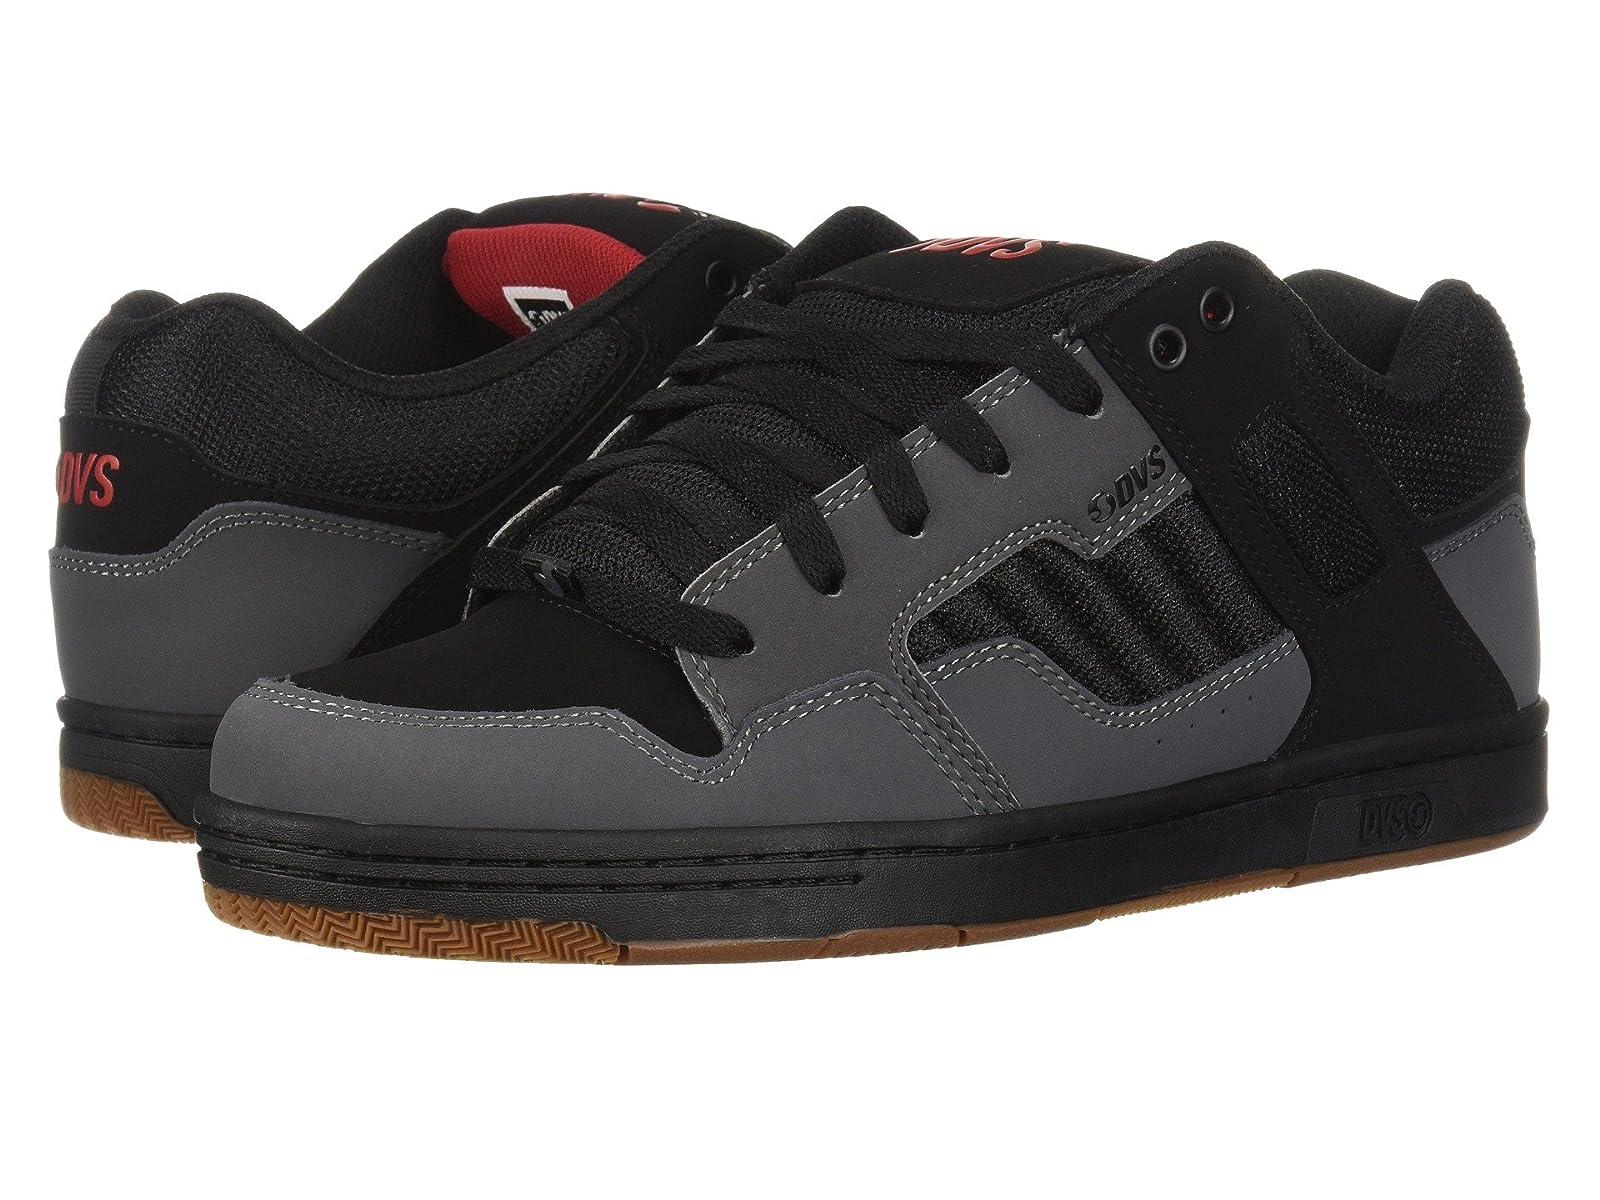 DVS Shoe Company Enduro 125Atmospheric grades have affordable shoes